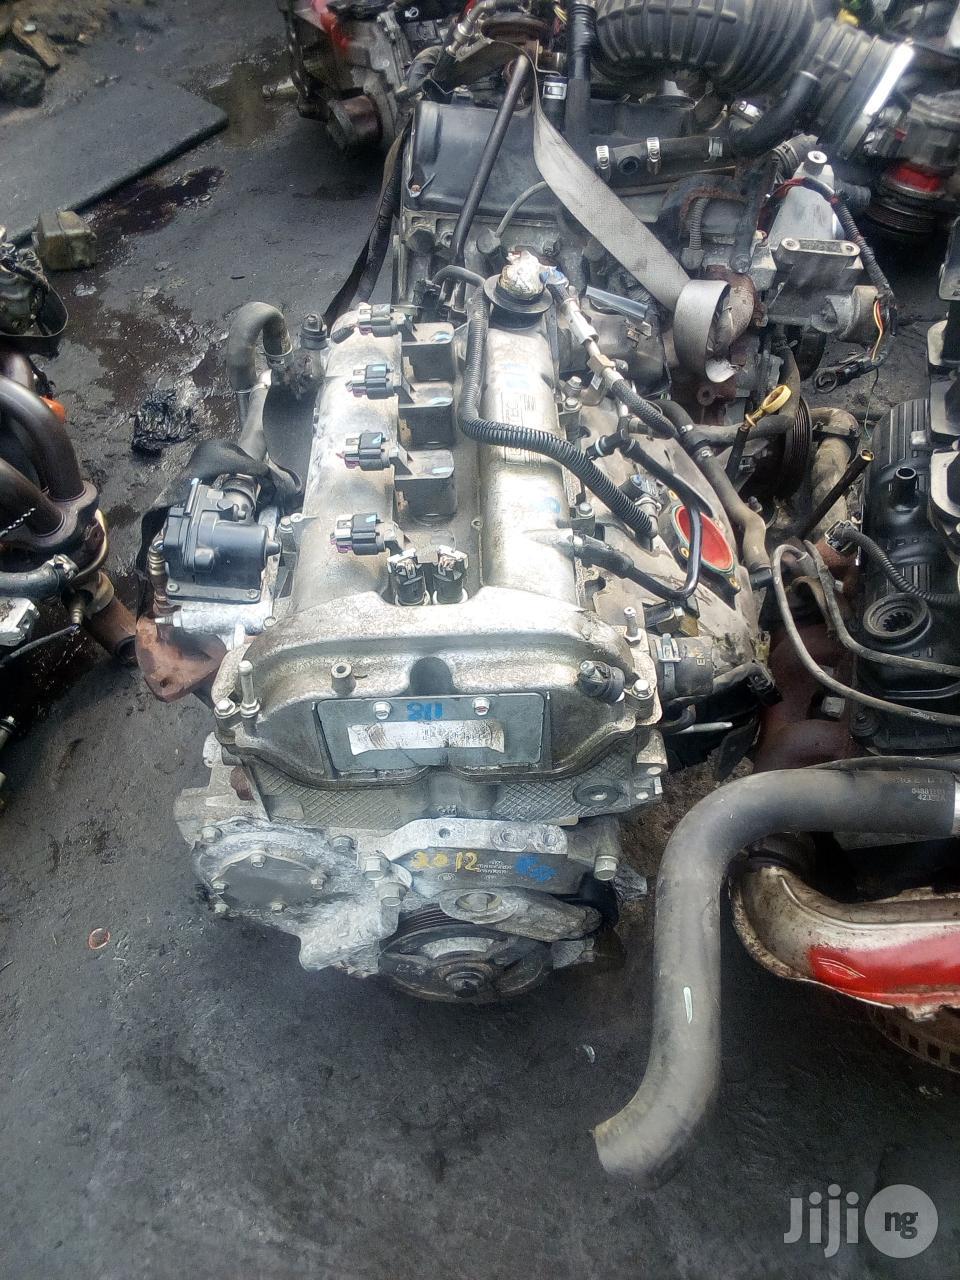 G M C Terrain In Mushin Vehicle Parts Accessories Micheal Boutsa Jiji Ng